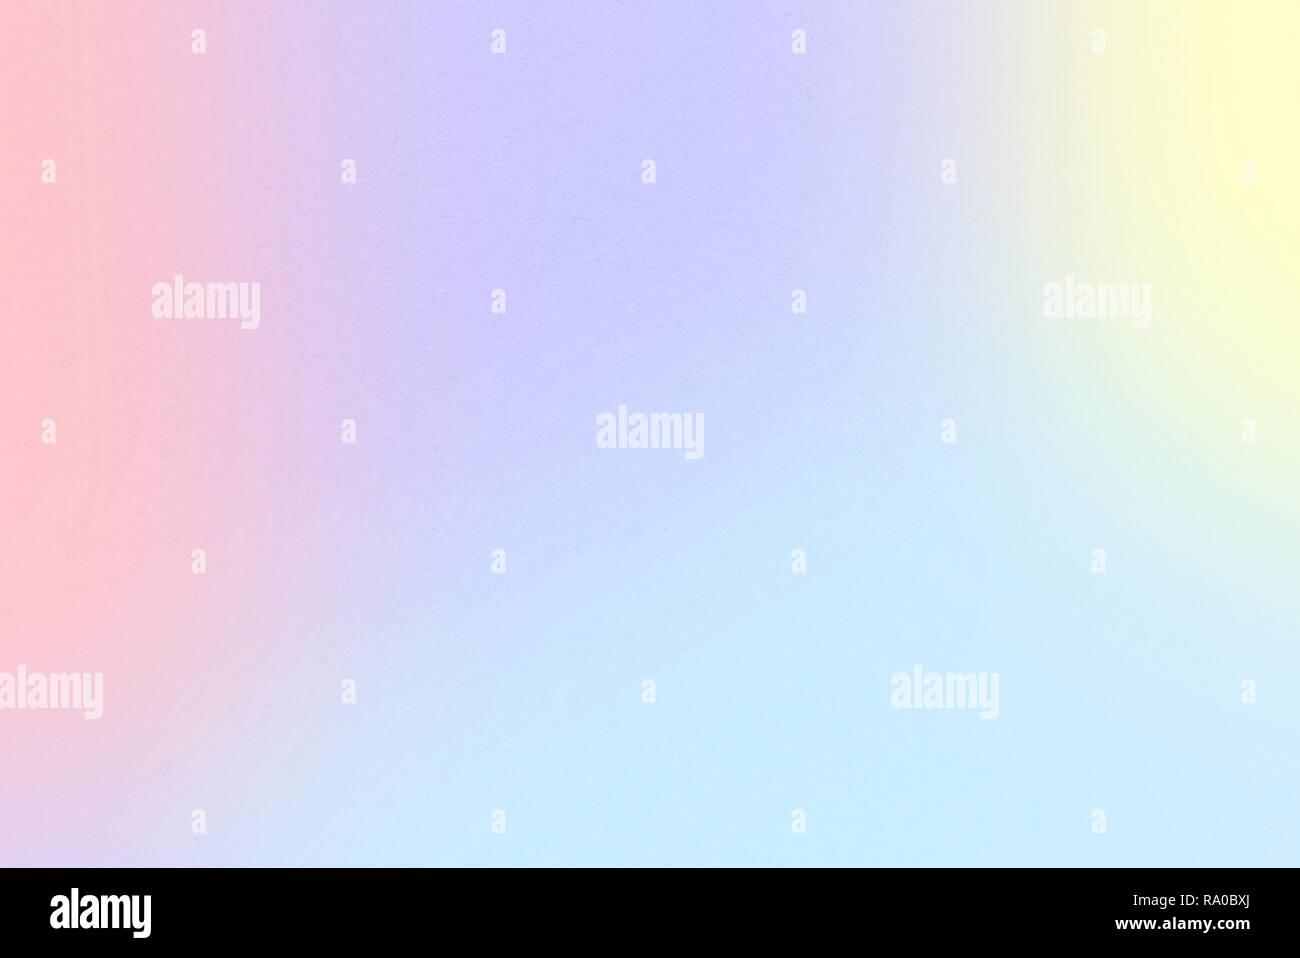 Rainbow Pastel gradient wallpaper background with Pastel Yellow, Maximum Blue Purple, Pale Cyan, Tulip, Melon, Magic Mint colors, and watercolor paper